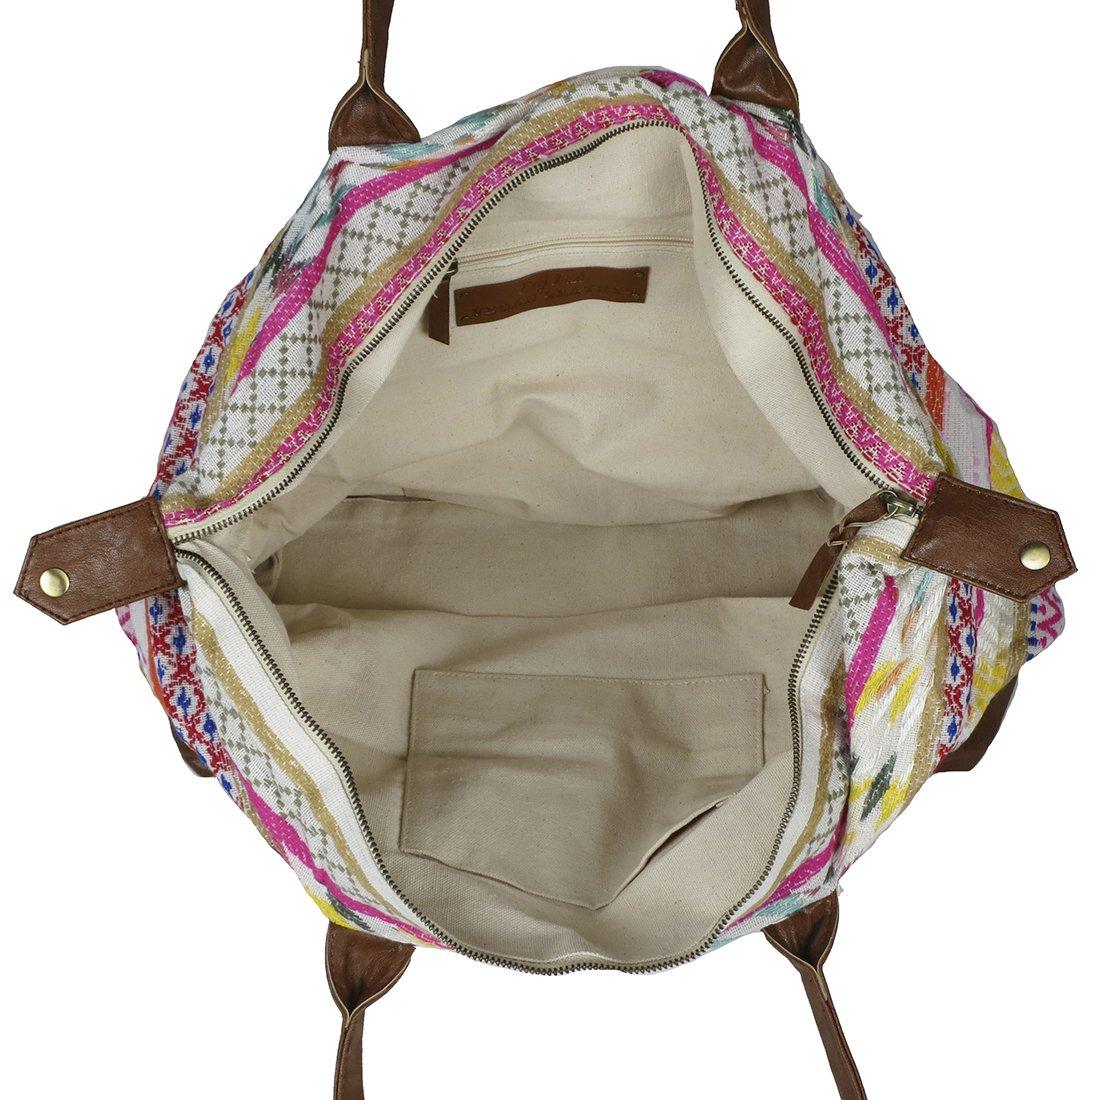 Raj Pink Multi Ethnic Print Duffle Bag Weekender with Leather by Raj Imports (Image #5)